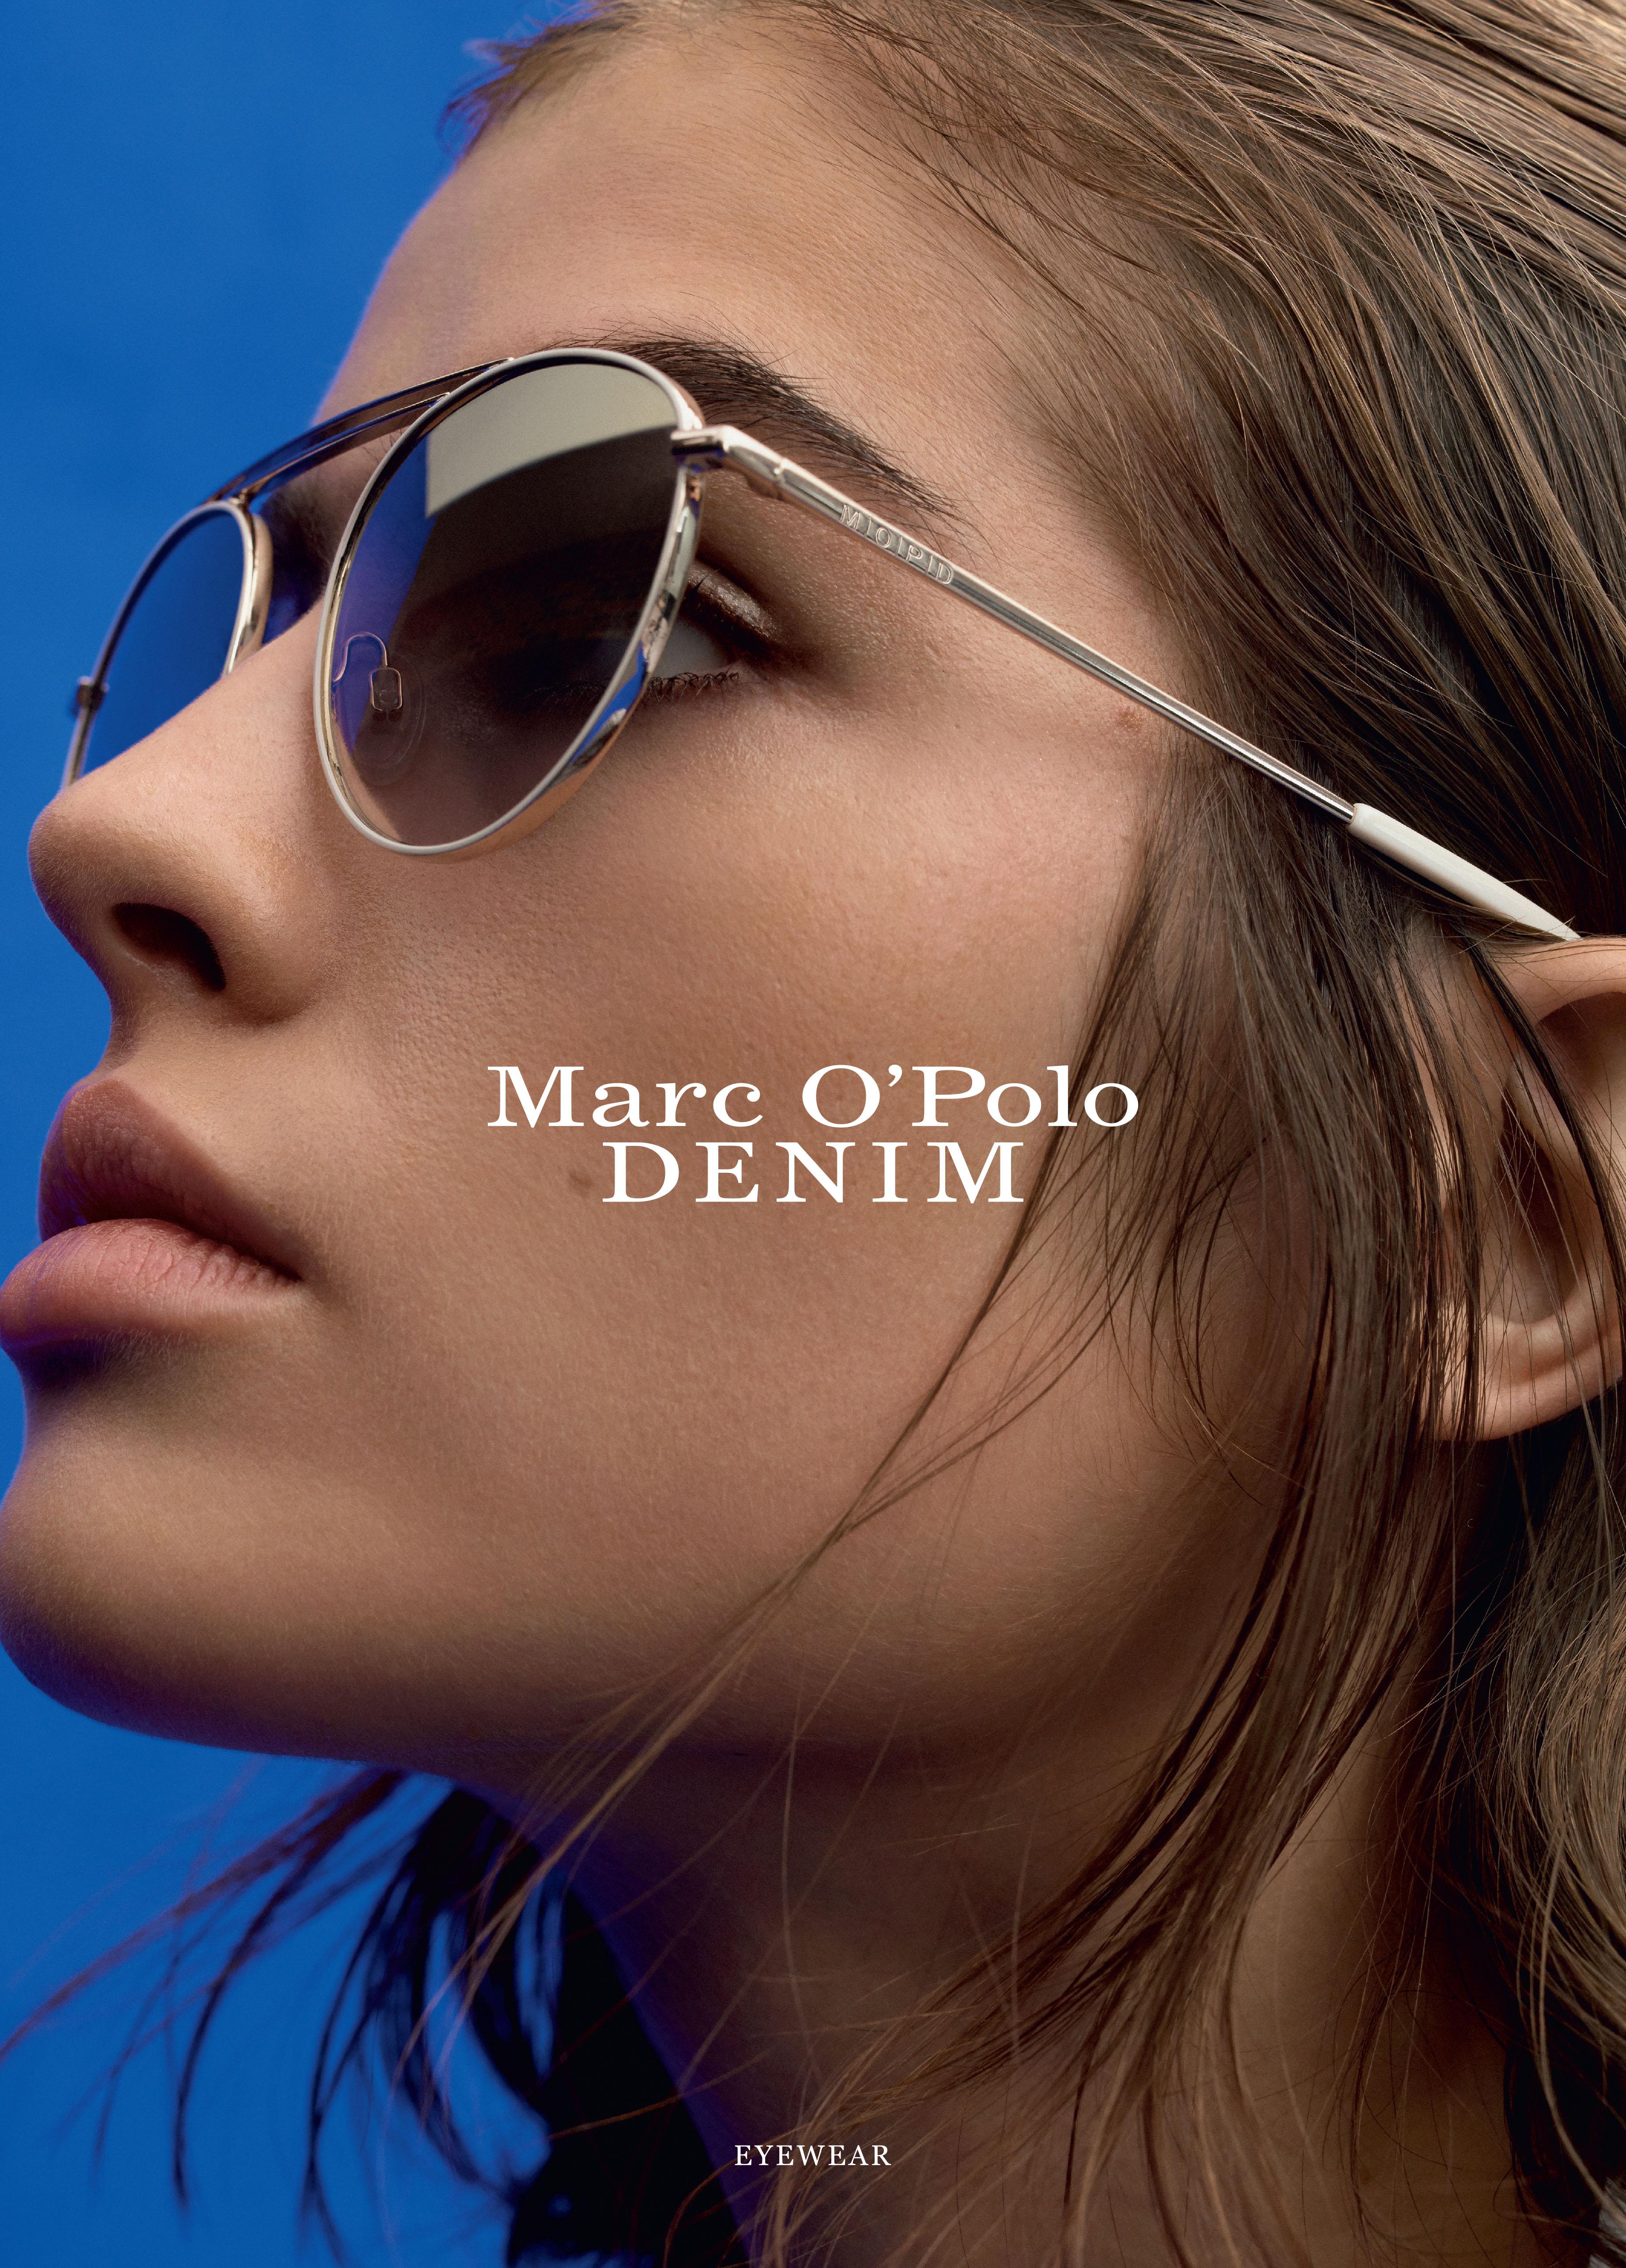 Marc O'Polo Eyewear SS2020 Campaign